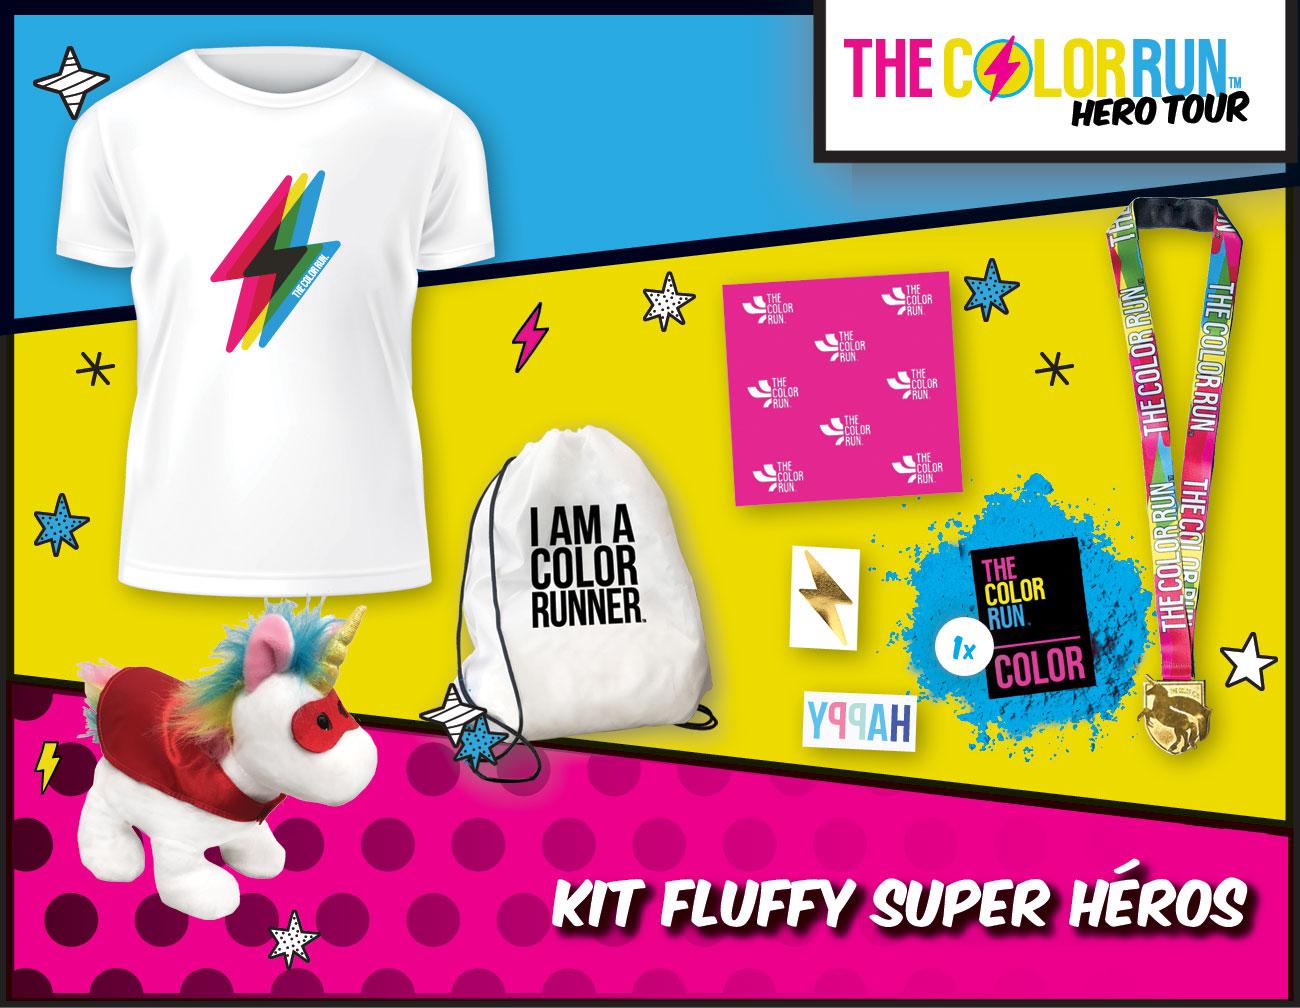 kid fluffy Super héros Participant Kit